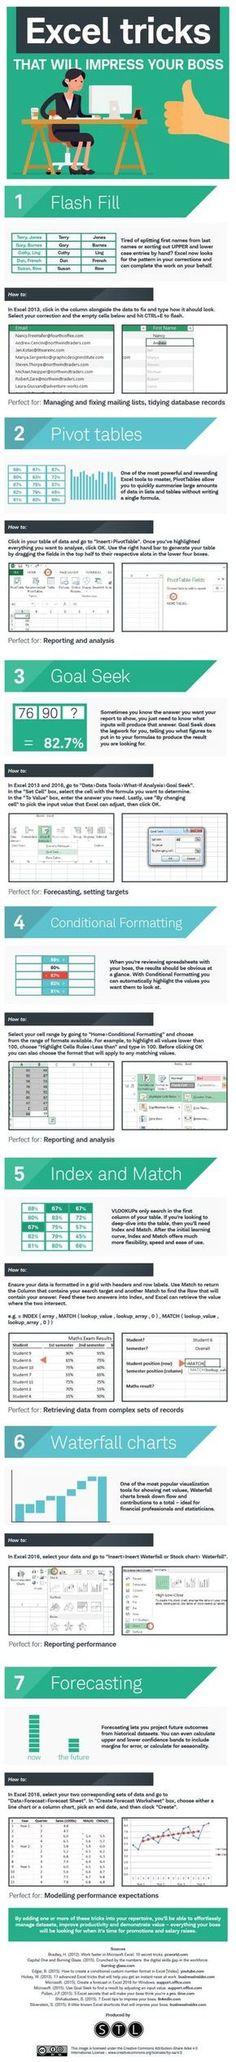 8 best 0555 - Microsoft Excel - 3D-Reference - 3D-Bezug images on - microsoft spreadsheet program crossword